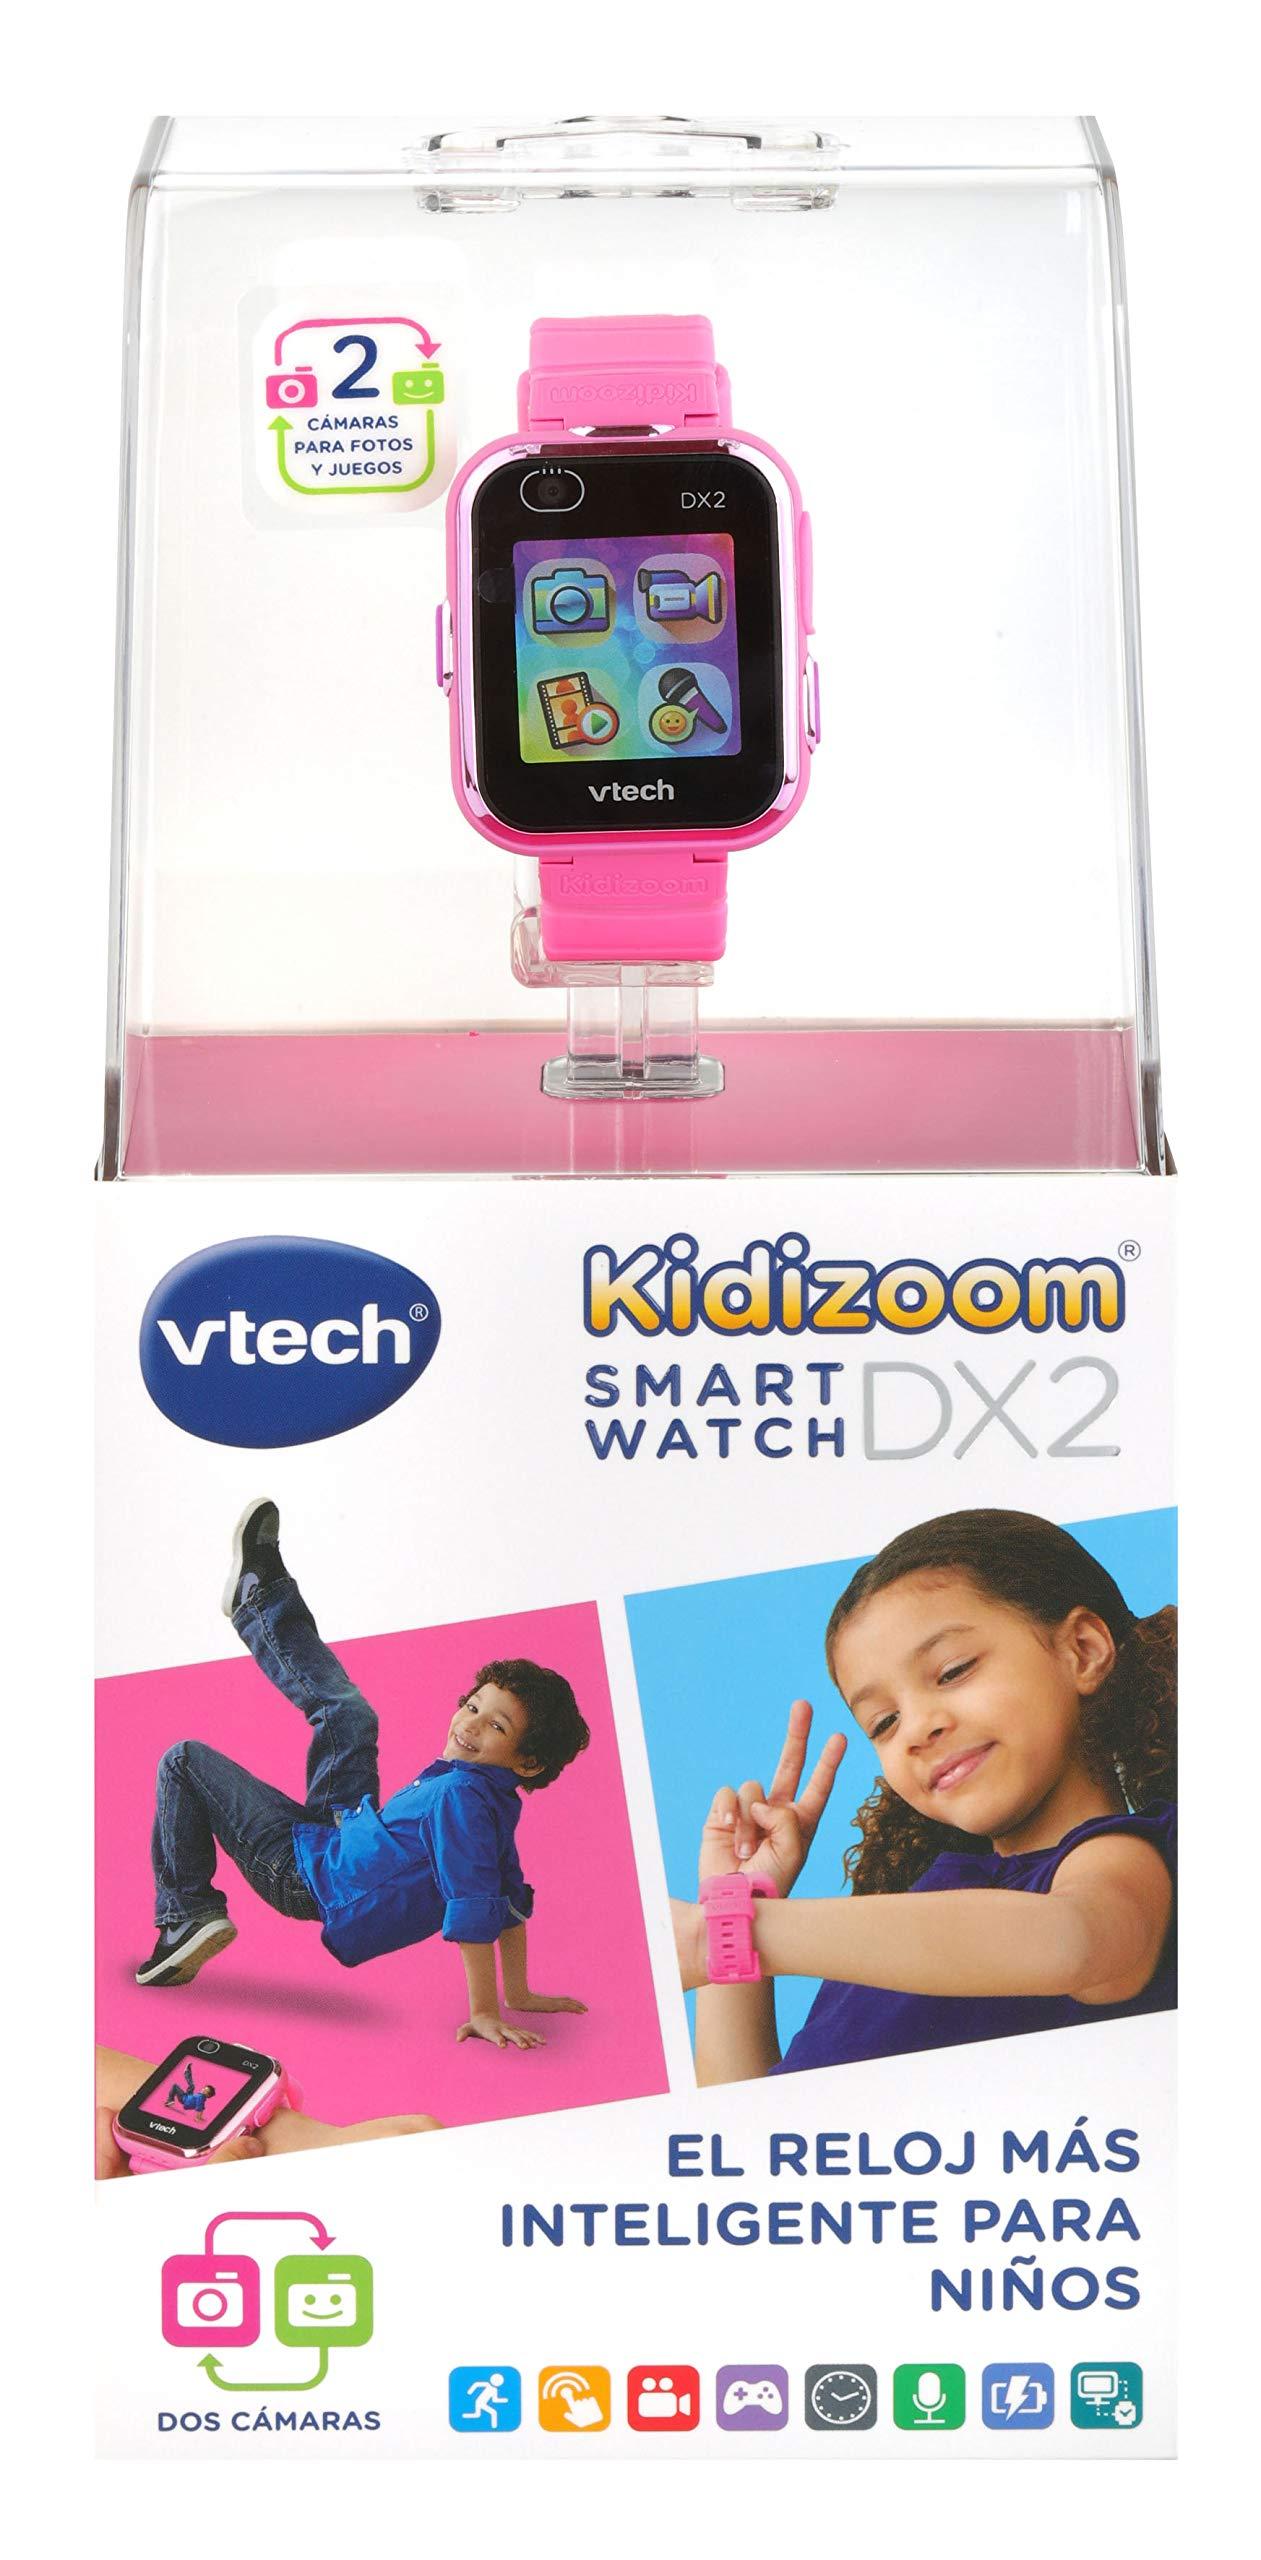 VTech Kidizoom Smart Watch DX2 - Reloj inteligente para niños con doble cámara 6